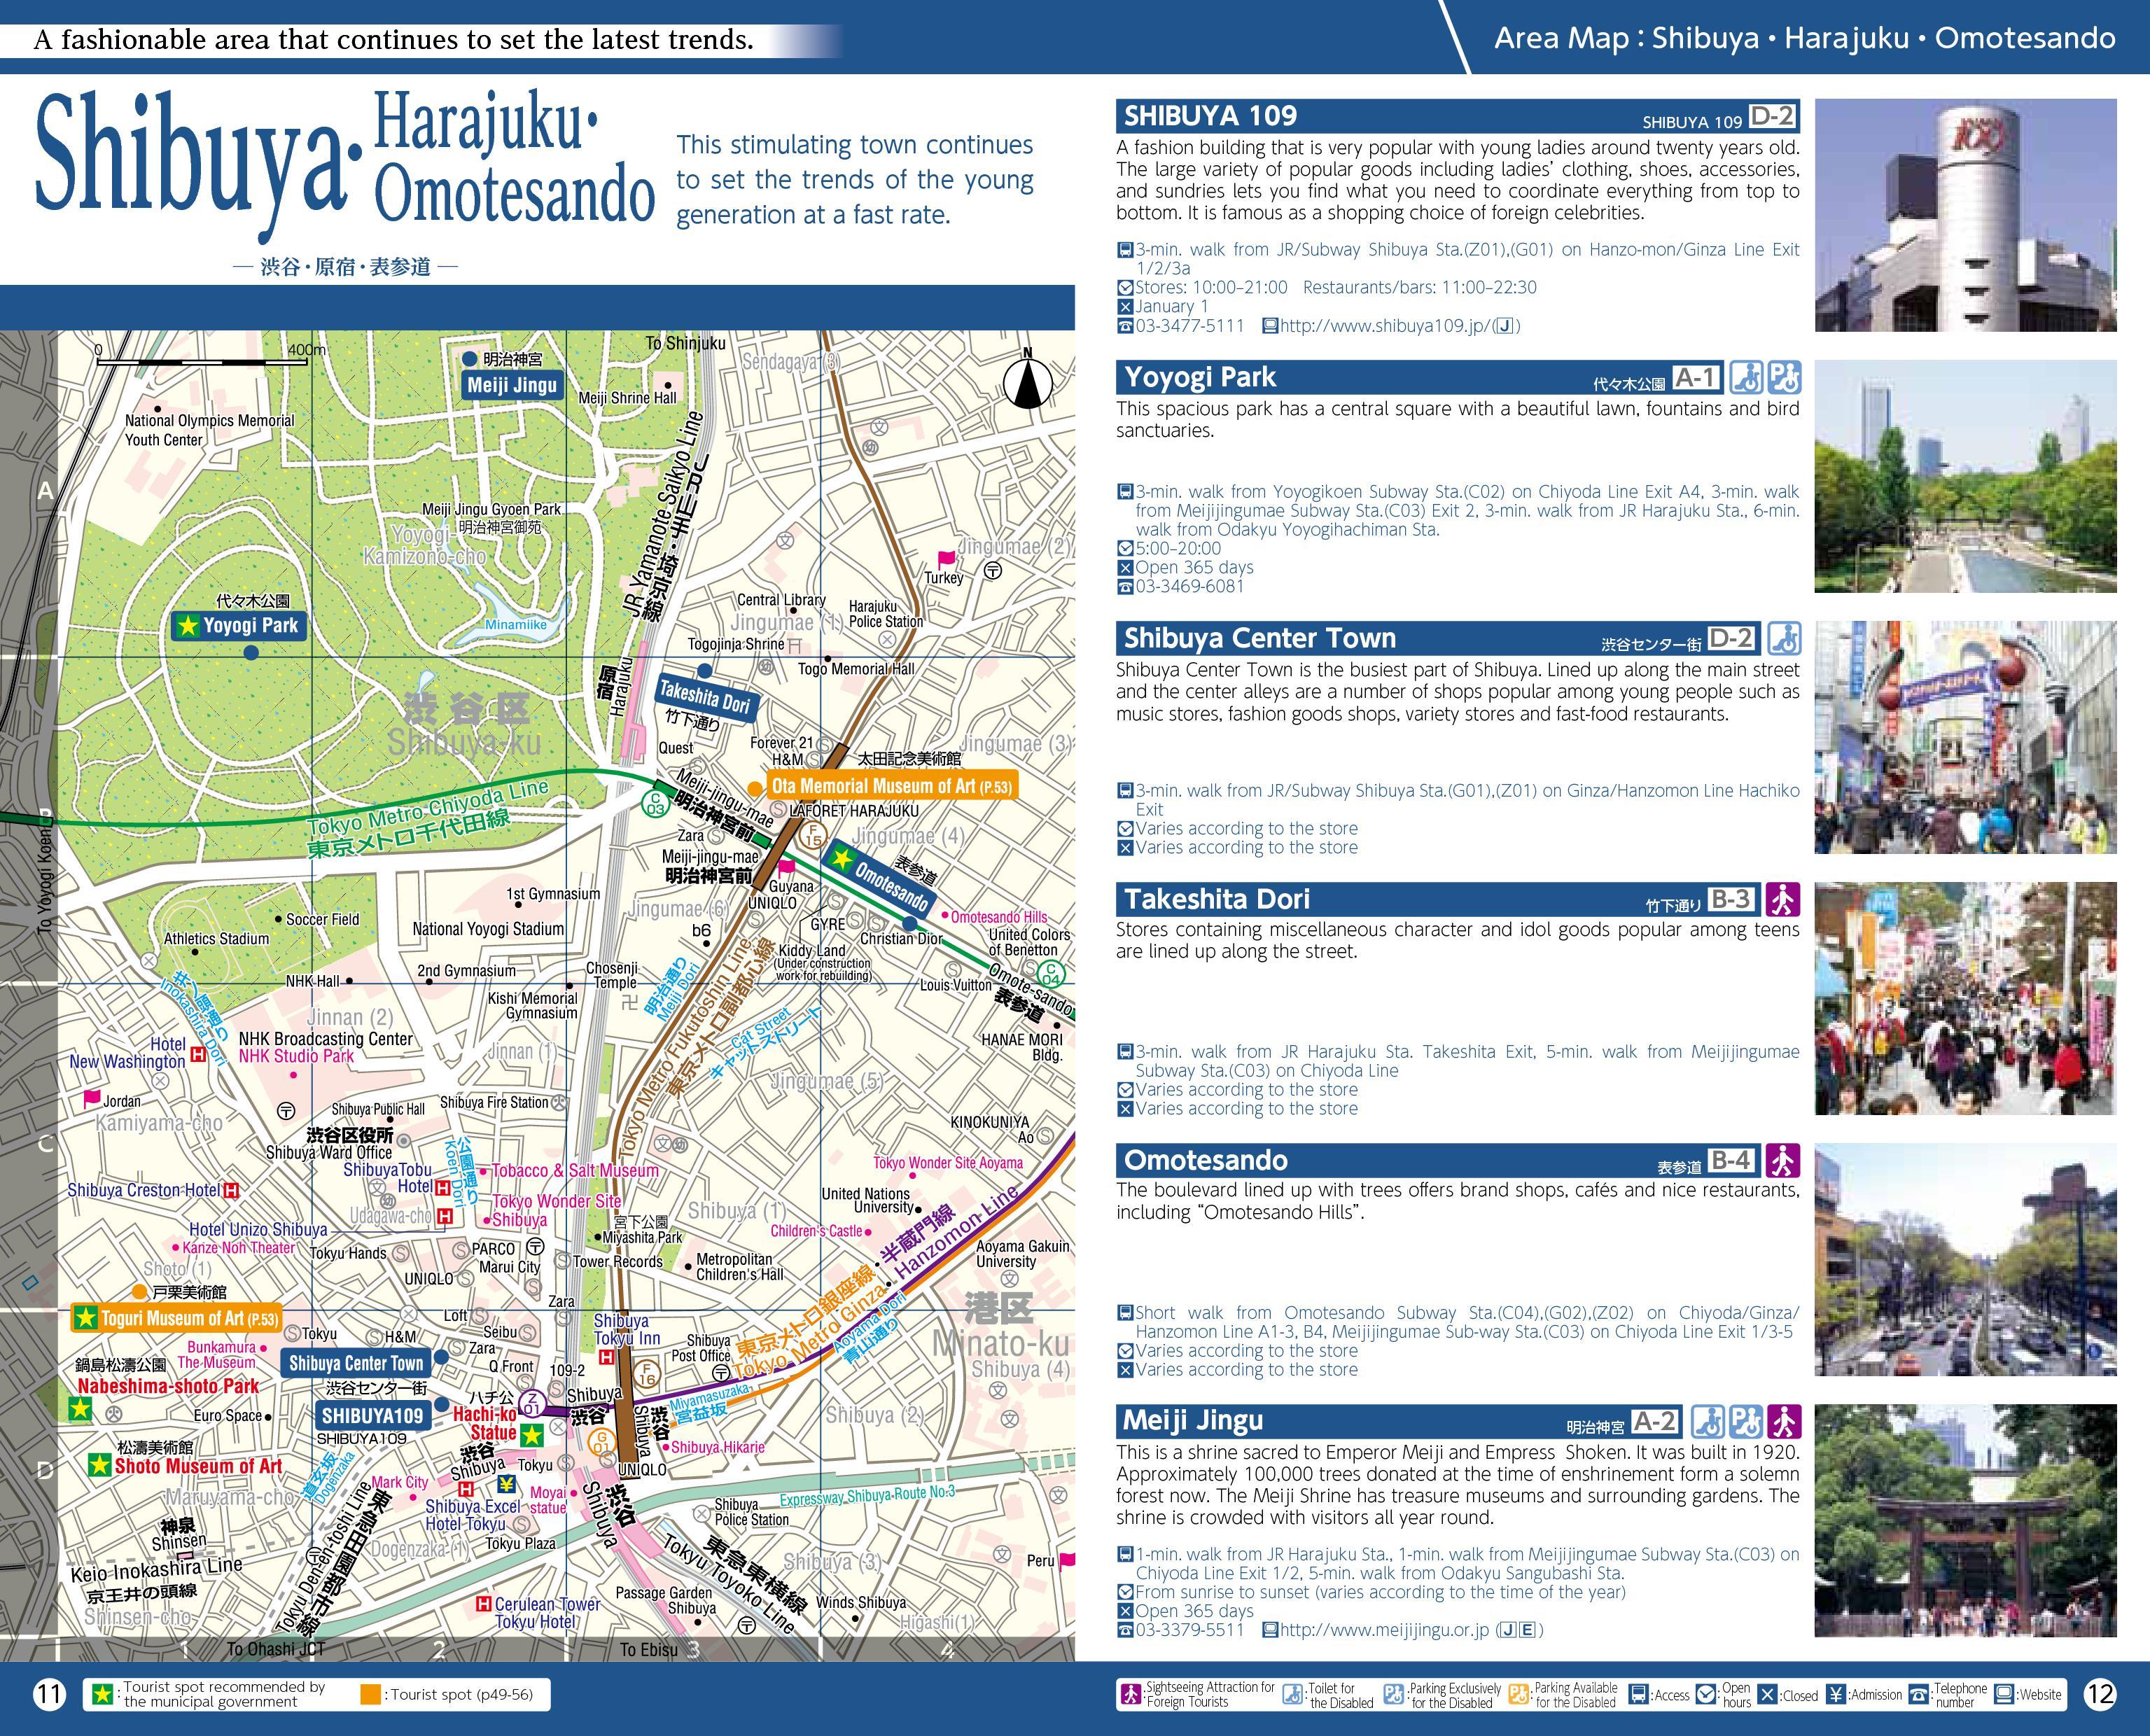 Shibuya Harajuku Omotesando Map - Japan map printable